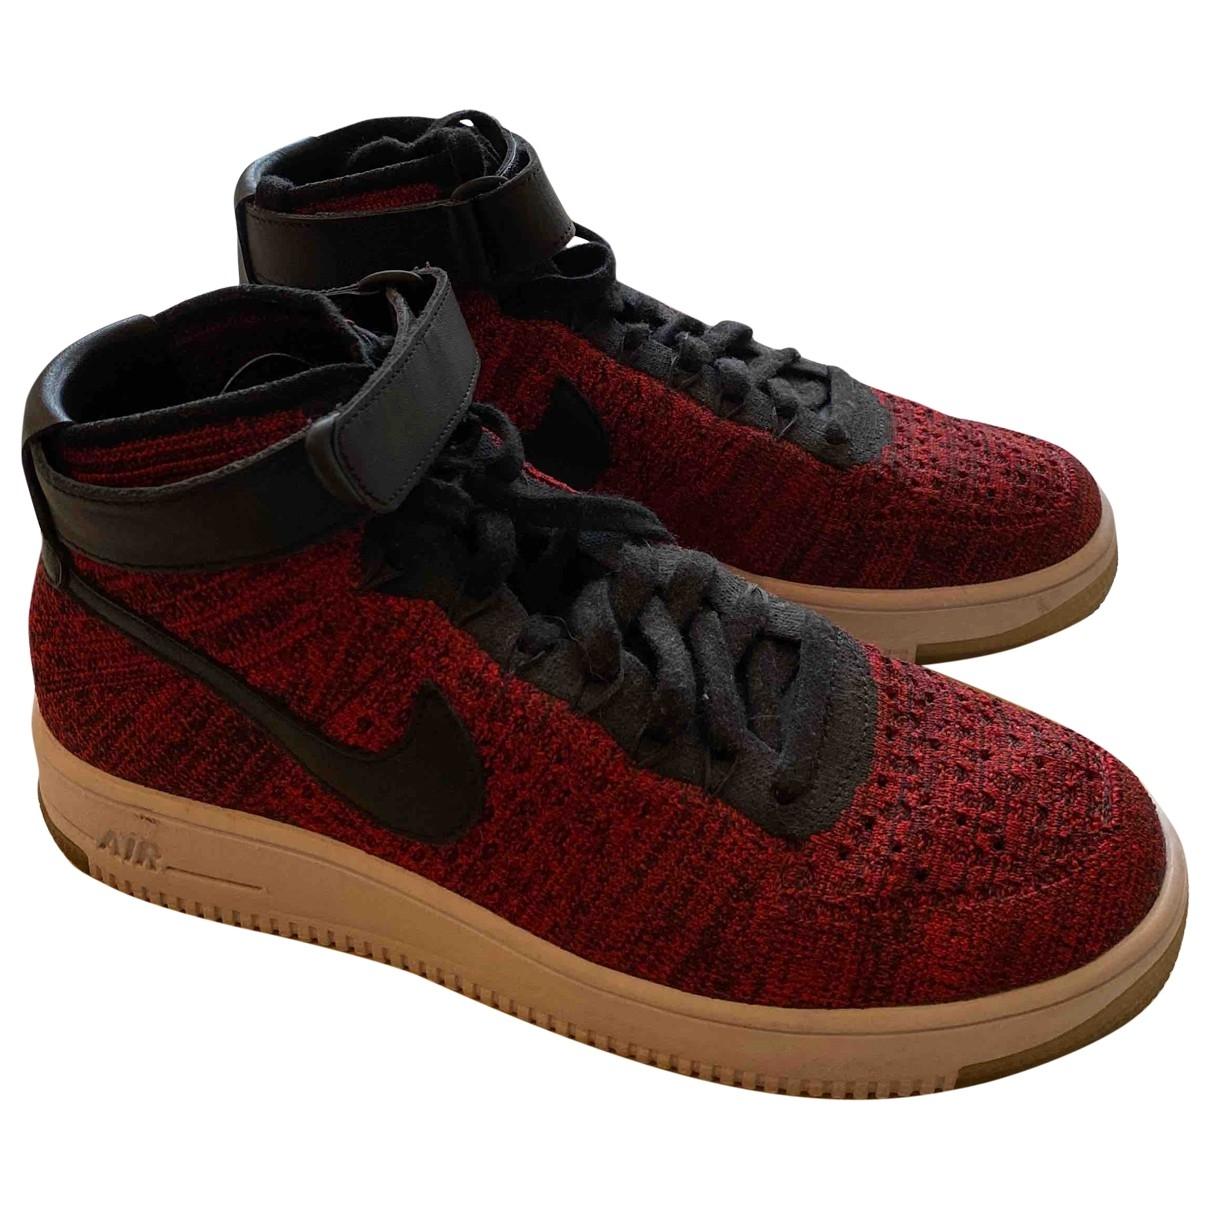 Nike - Baskets Air Force 1 pour homme en toile - rouge